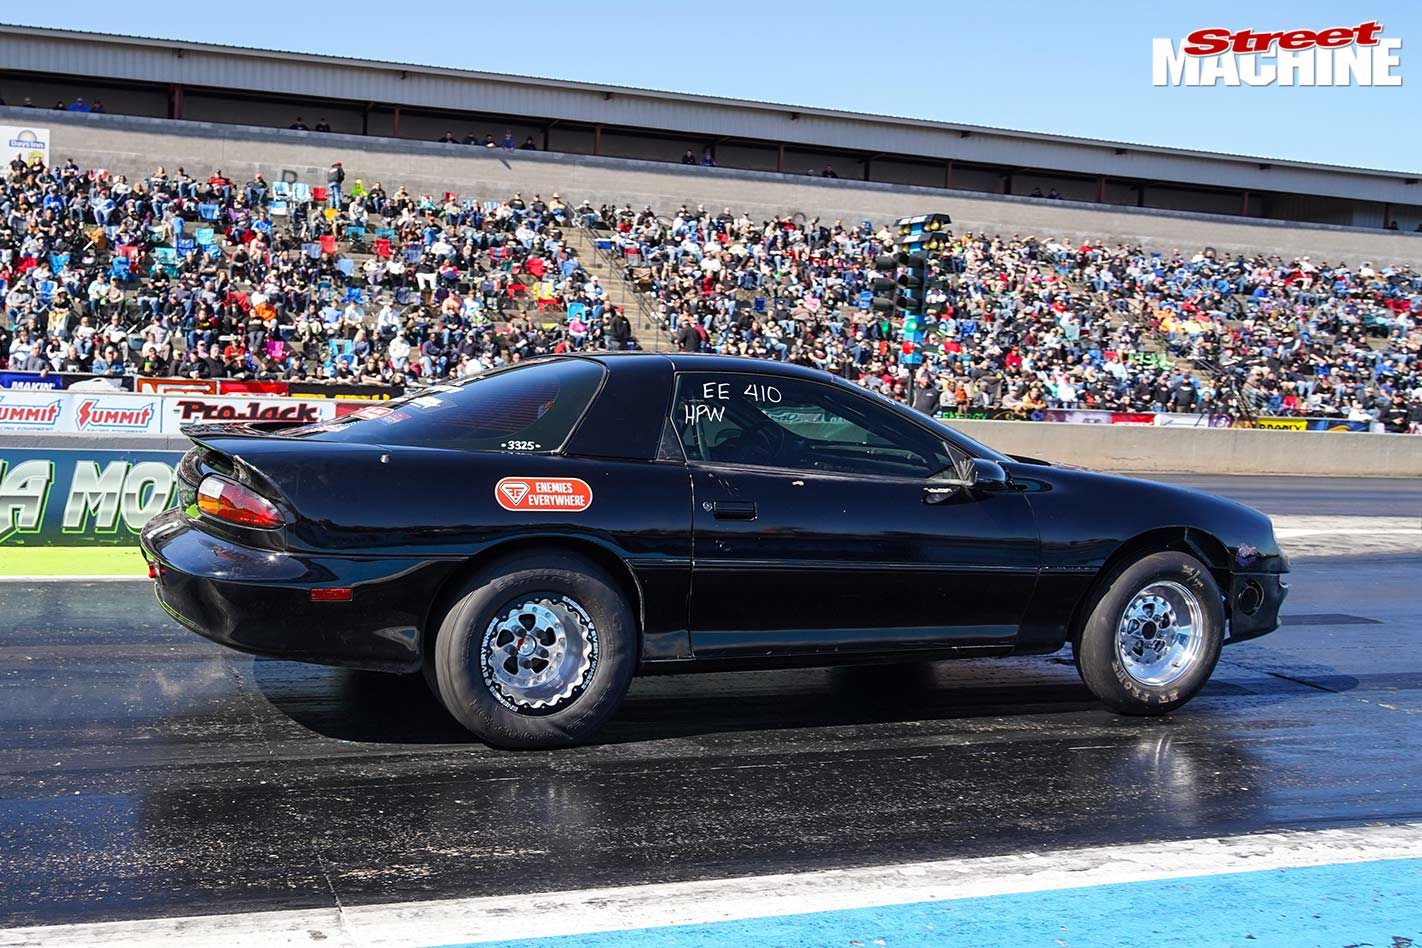 Aussie-built 1998 Camaro wins Horsepower Wars Drag Shootout